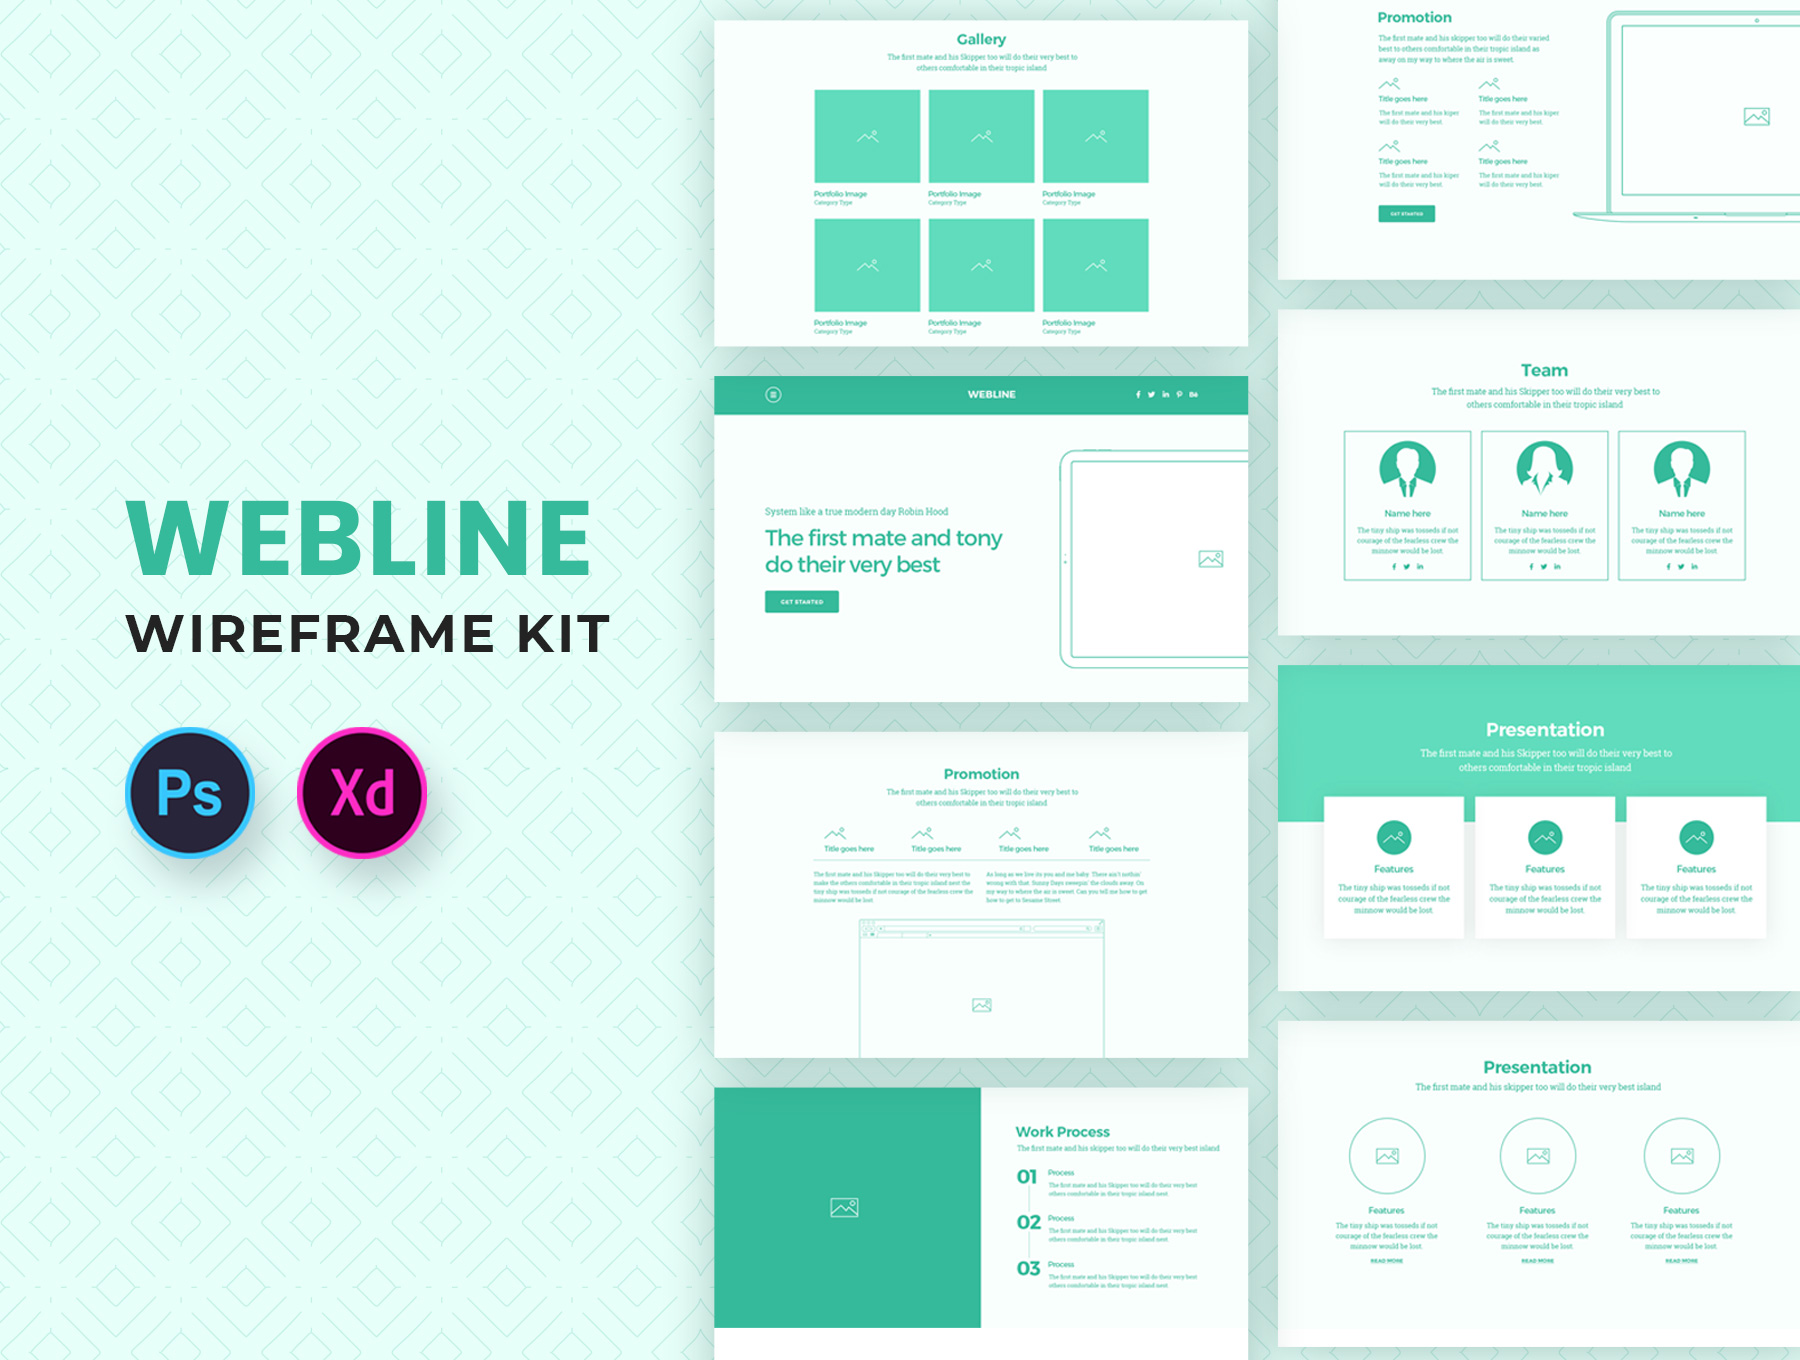 Webline-Wireframe